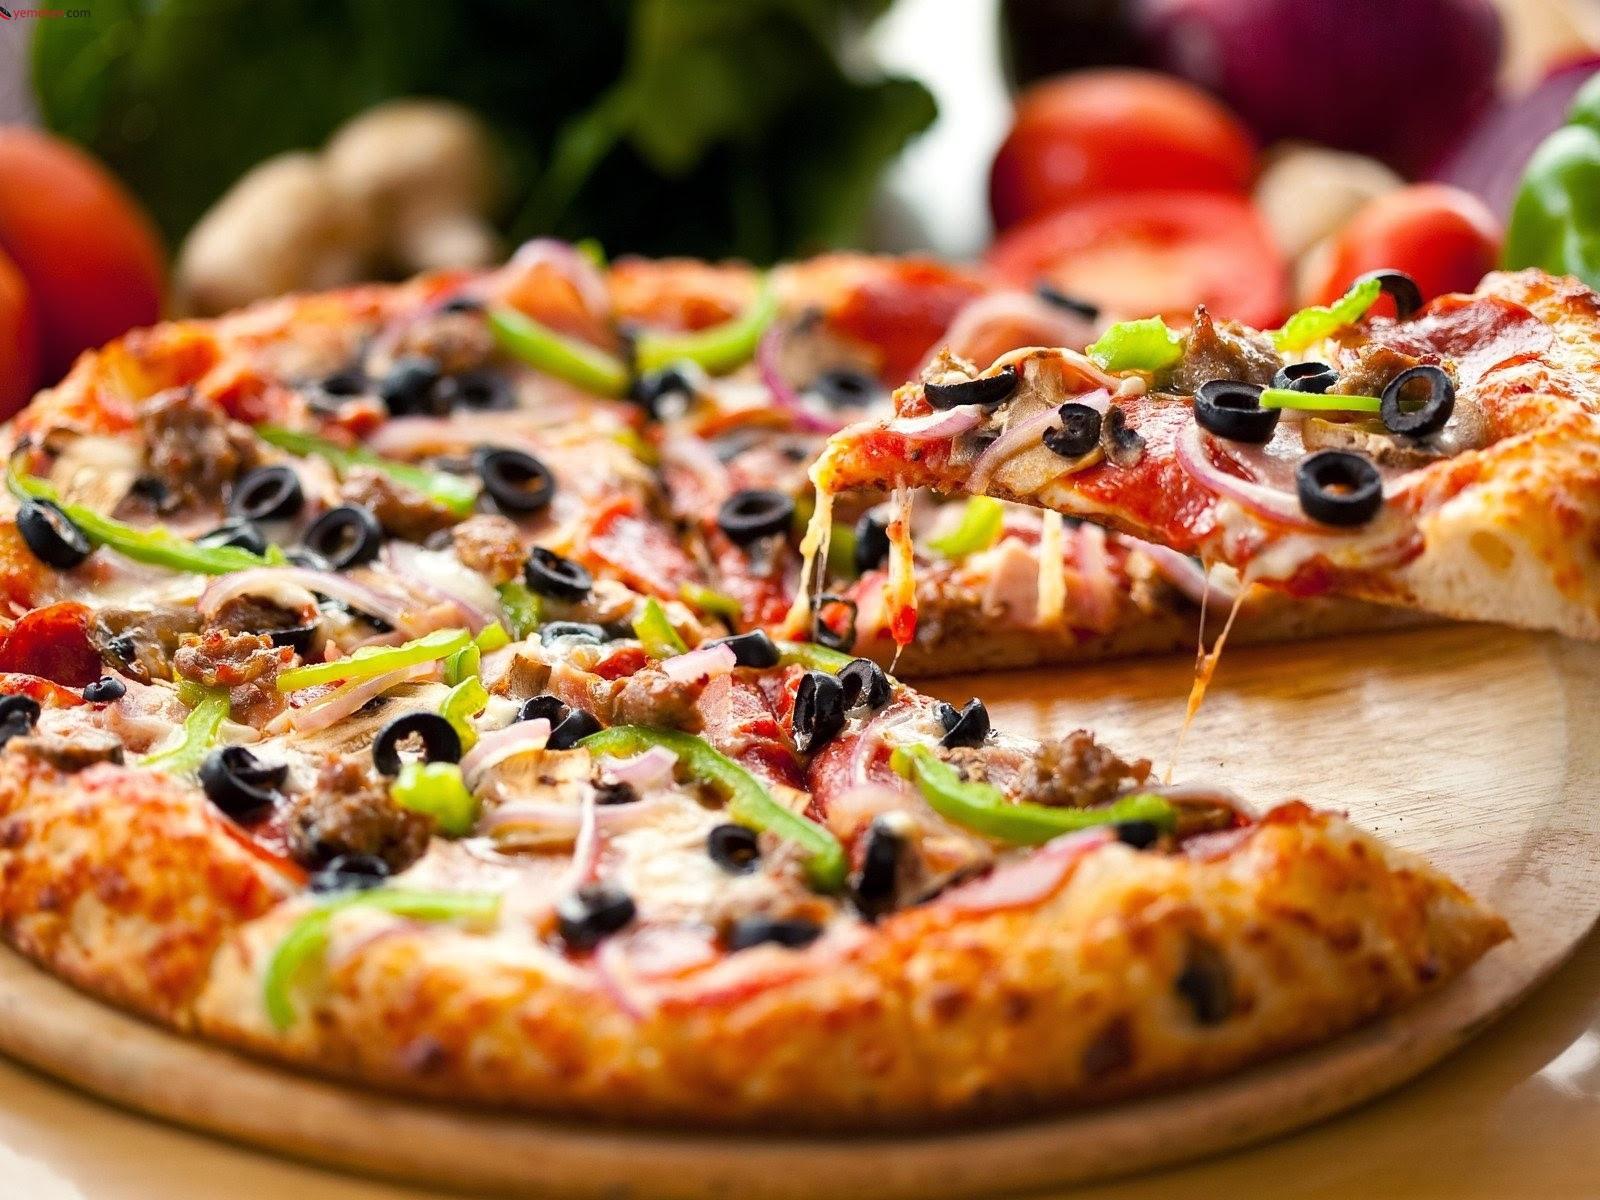 Mayasız Hamurdan Pizza Videosu 69